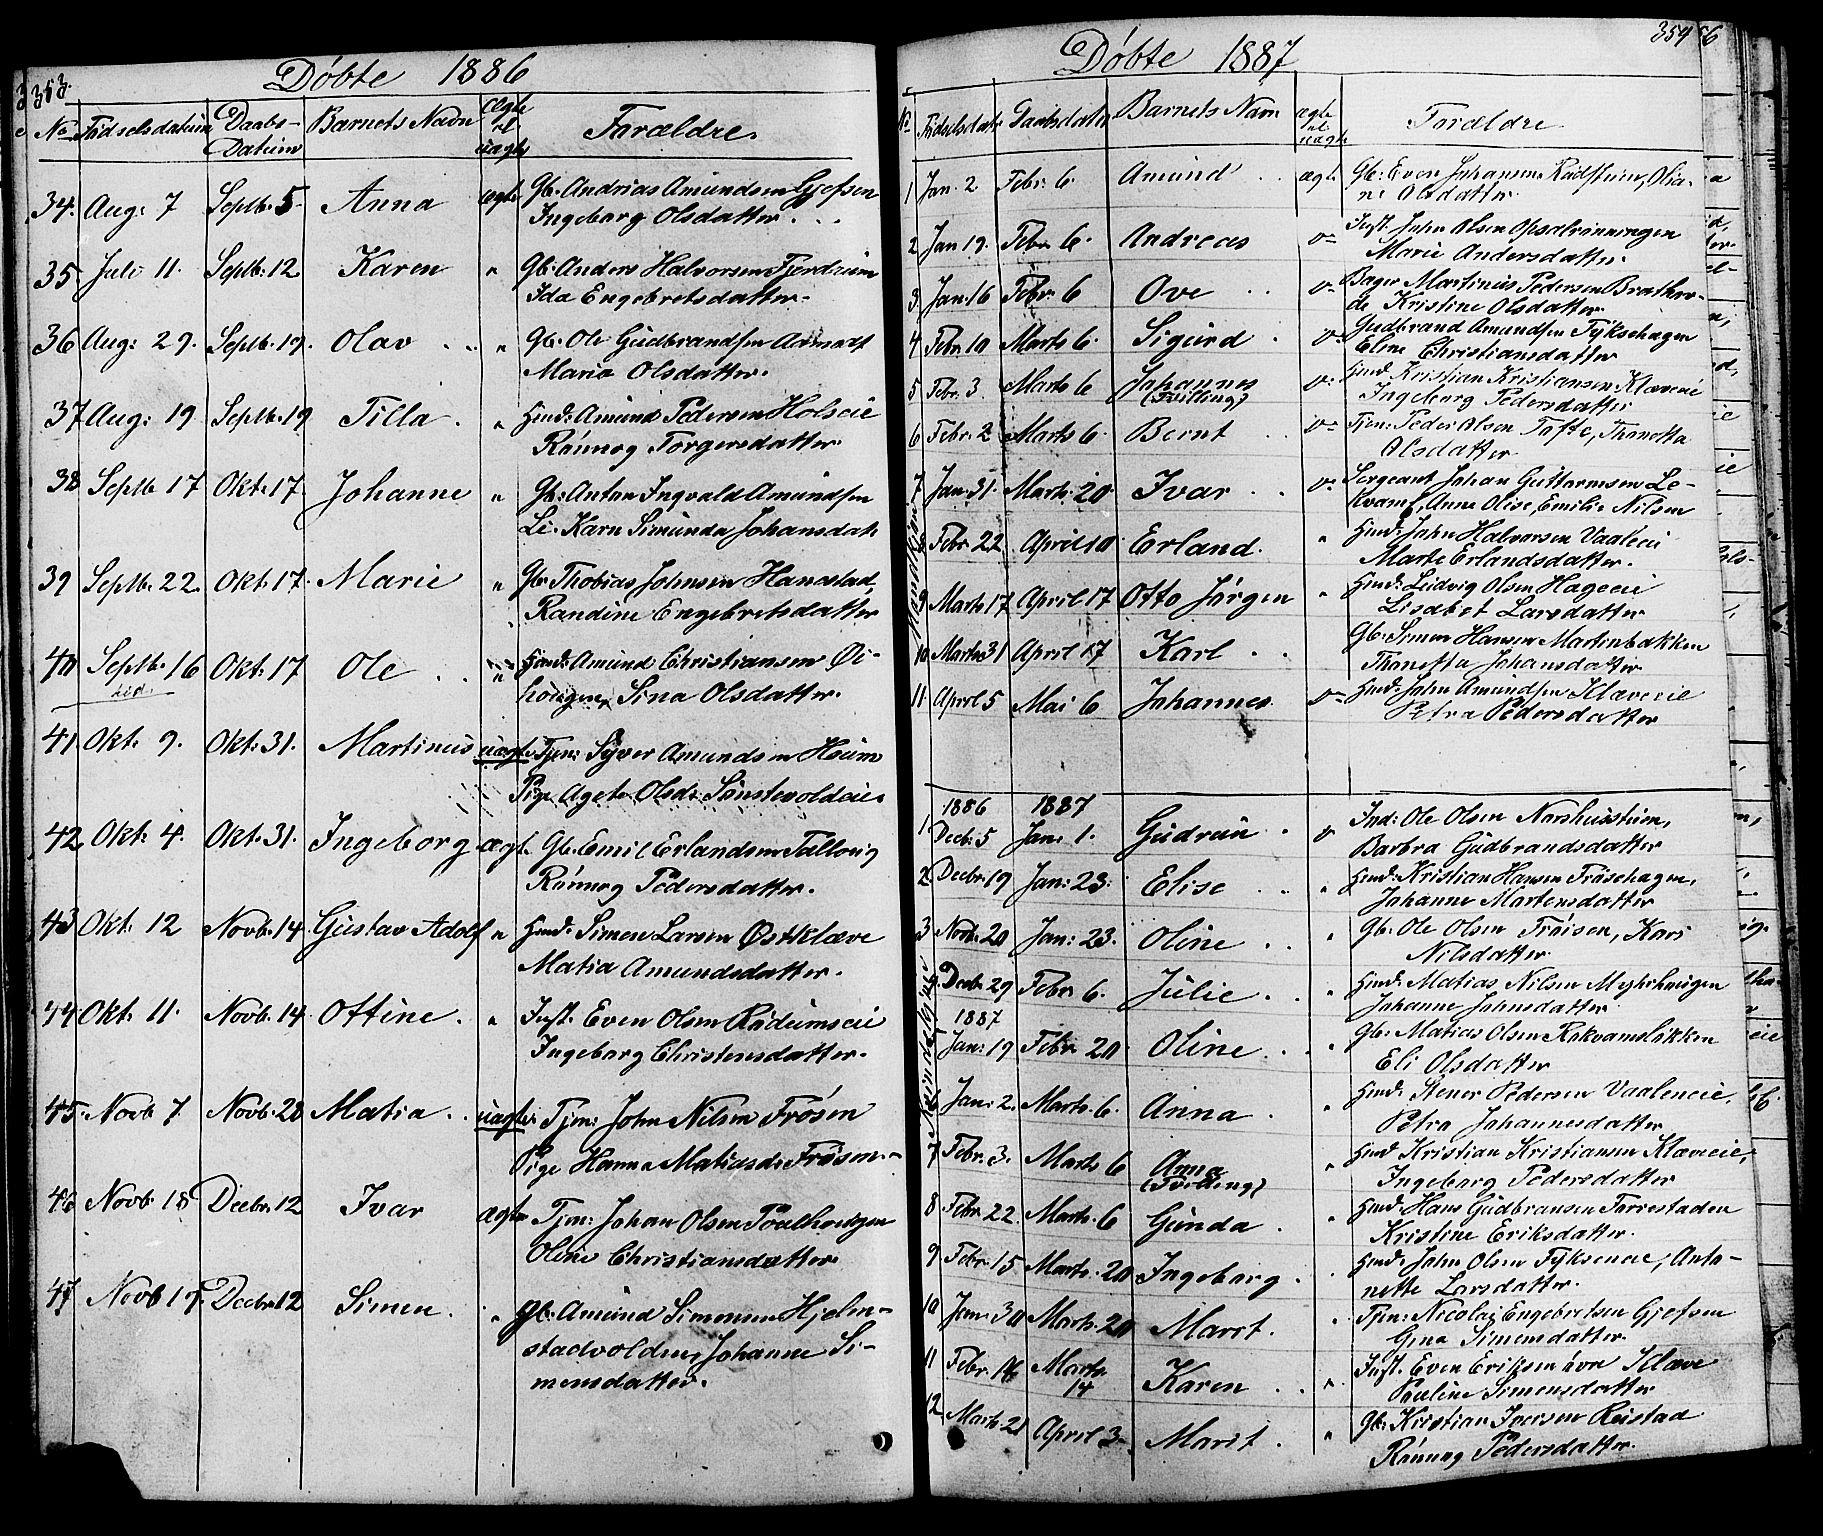 SAH, Østre Gausdal prestekontor, Klokkerbok nr. 1, 1863-1893, s. 353-354